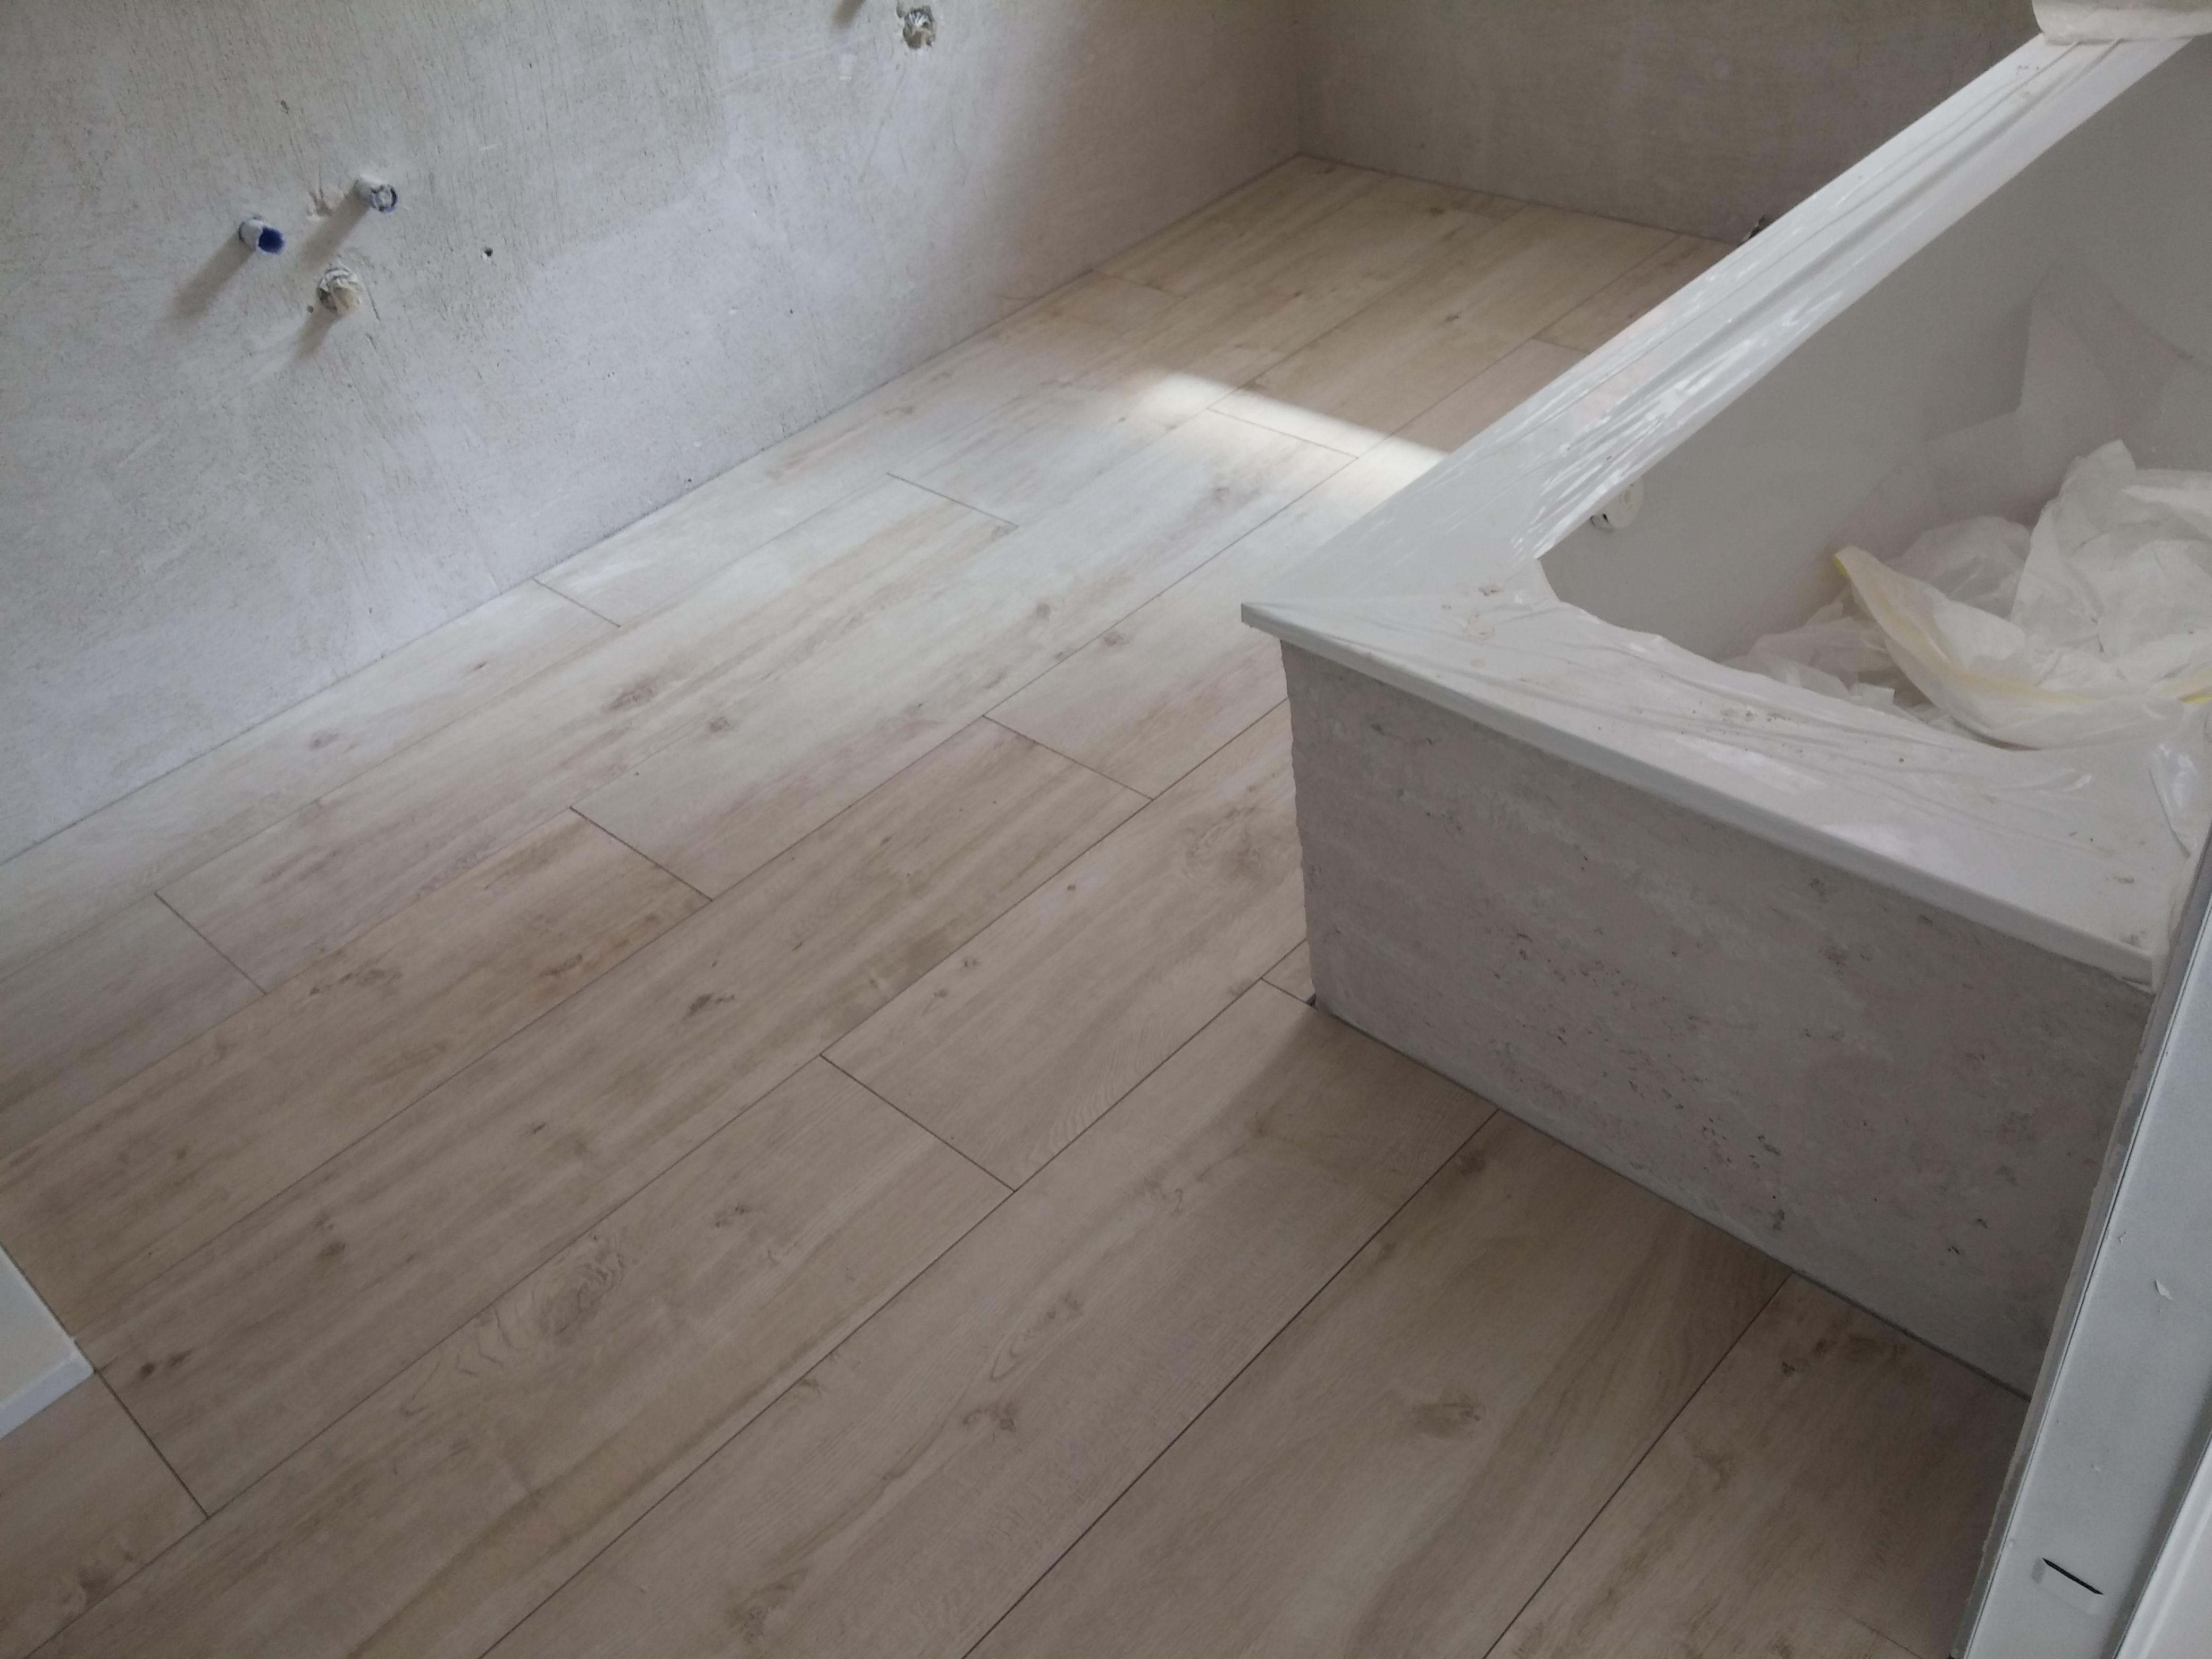 Pavimento effetto legno bagno kj94 regardsdefemmes for Pavimenti x esterni ikea